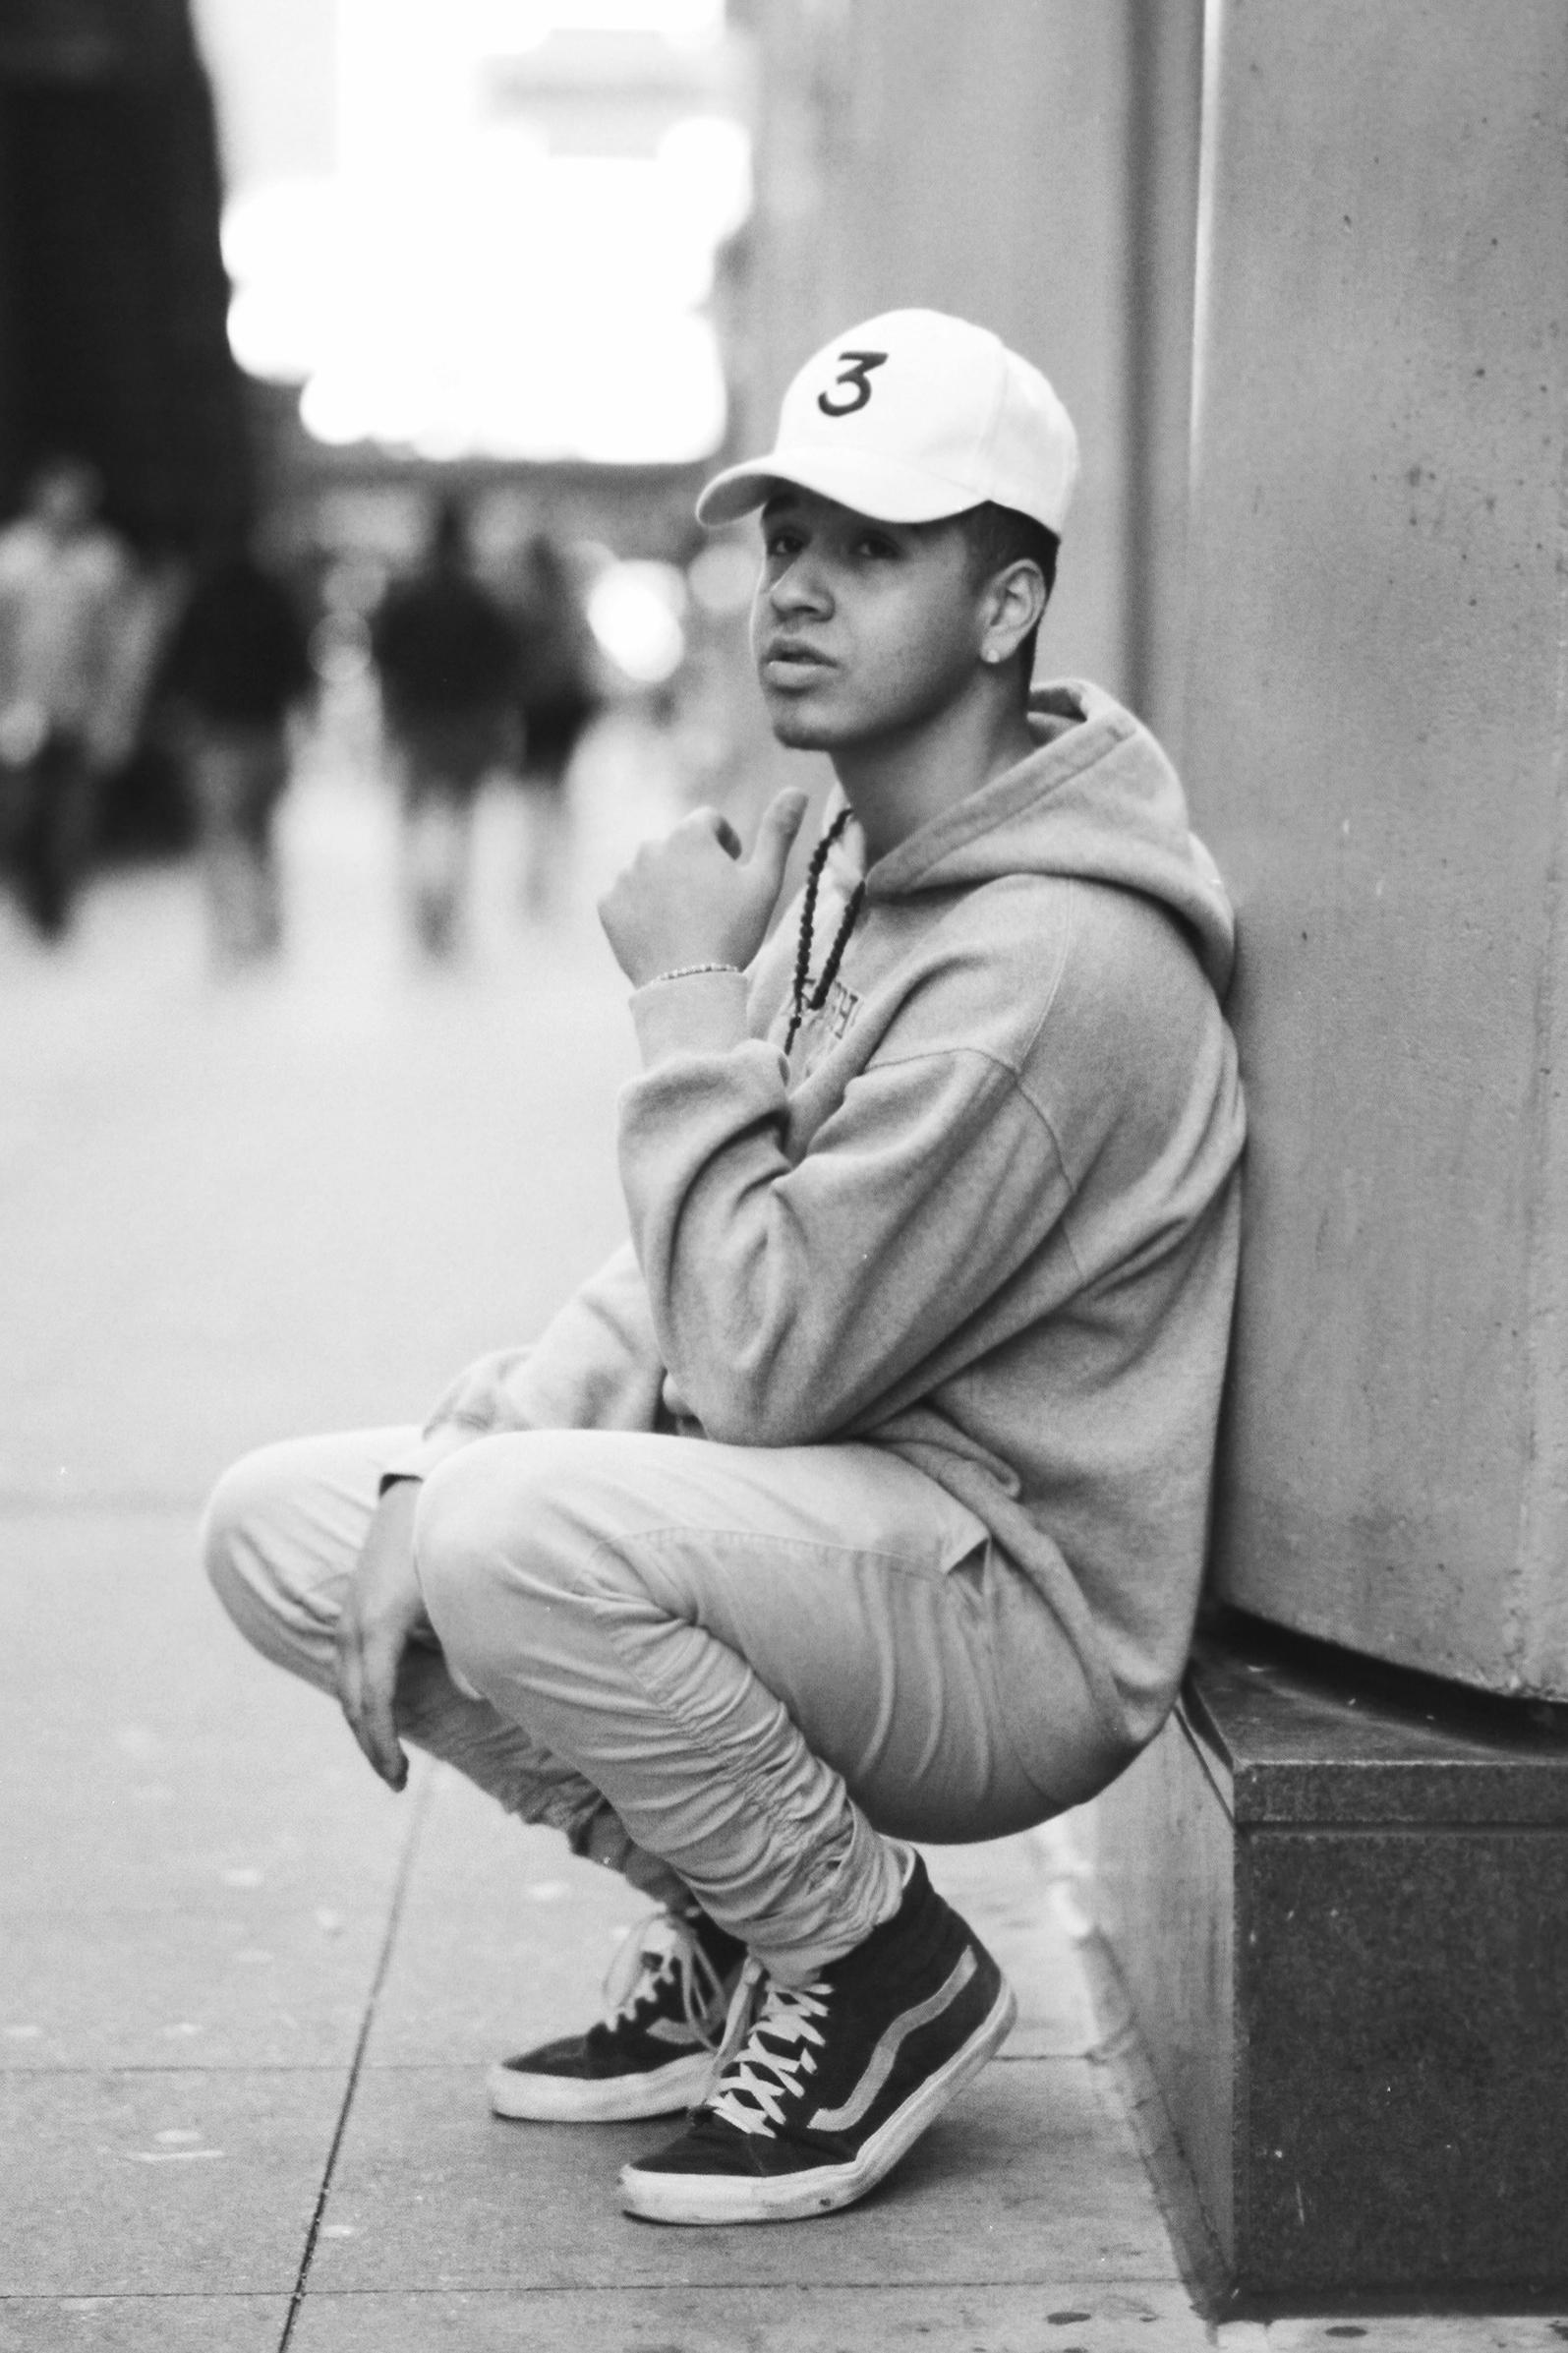 35mm film street portrait by zshare photovisionsjpg